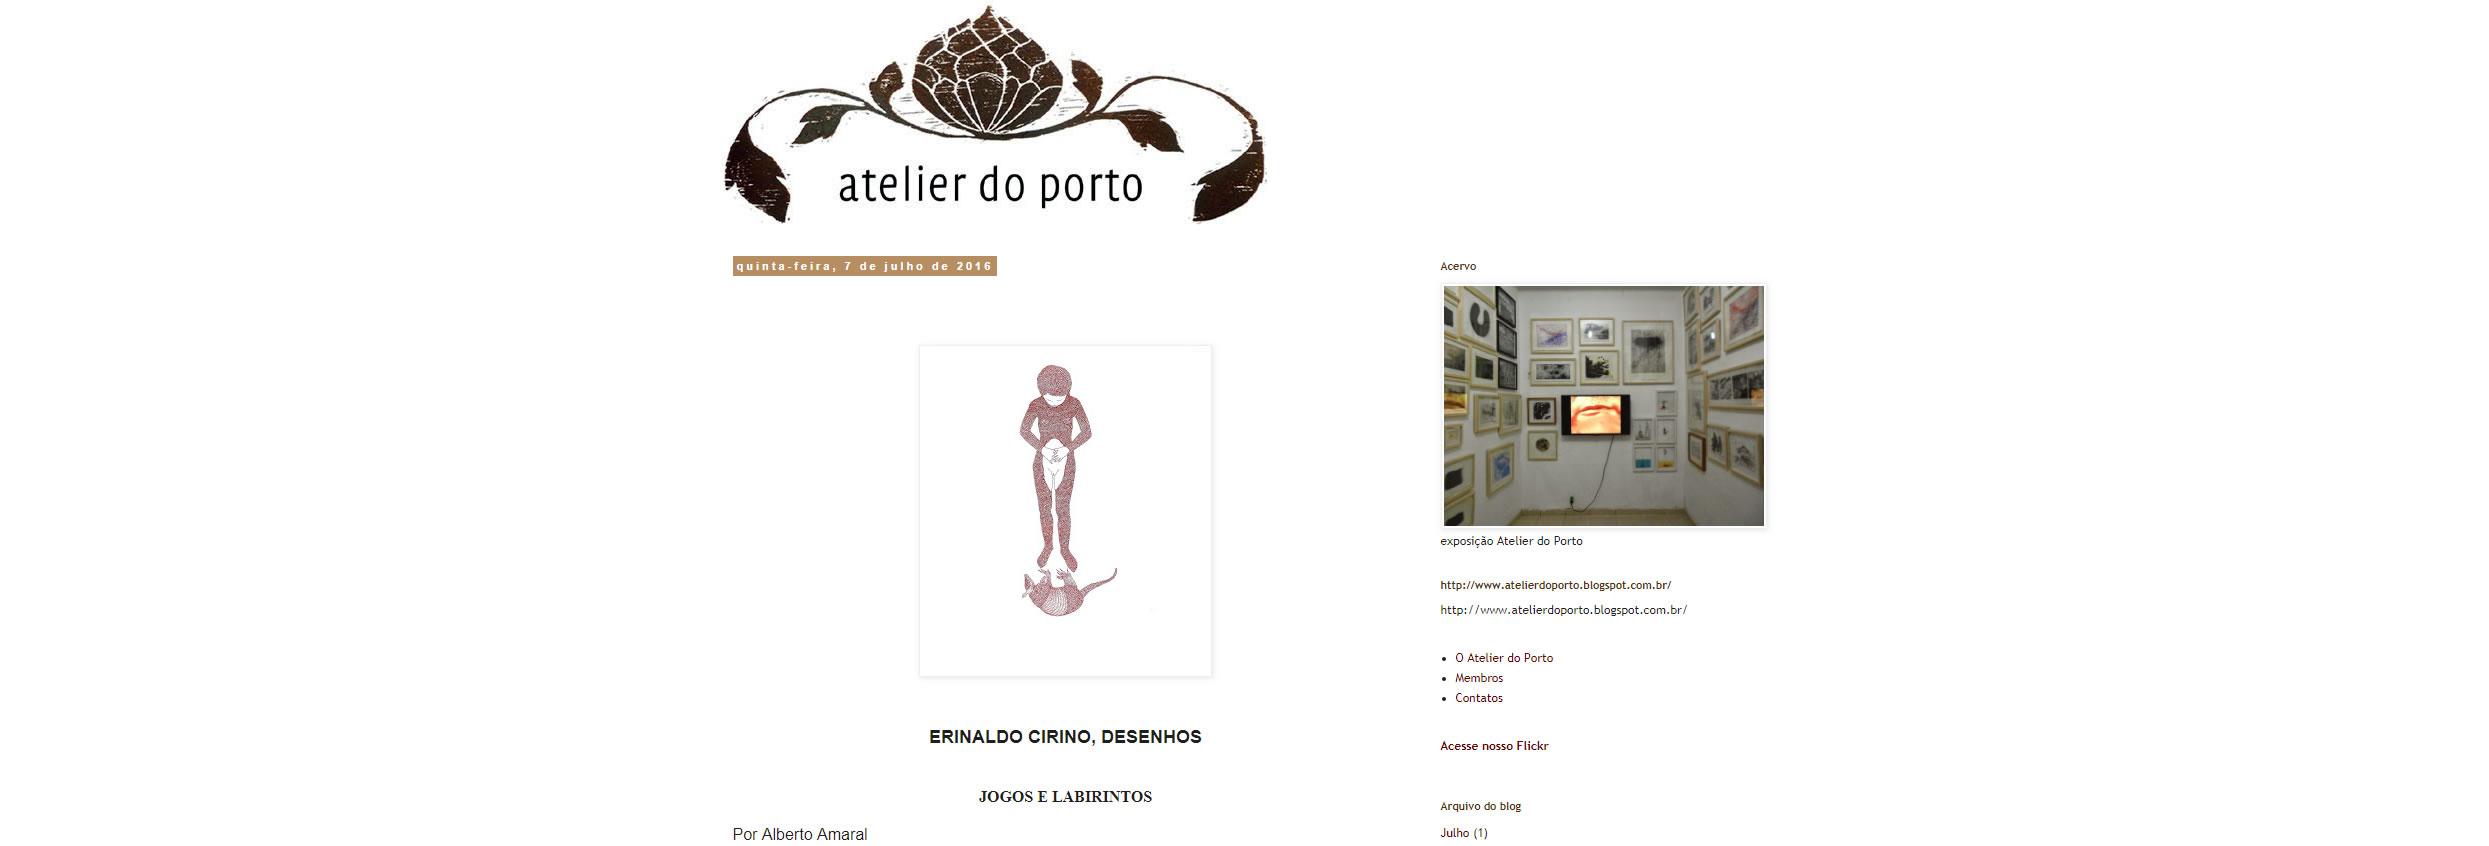 atelier_do_porto_galeria_de_gravura